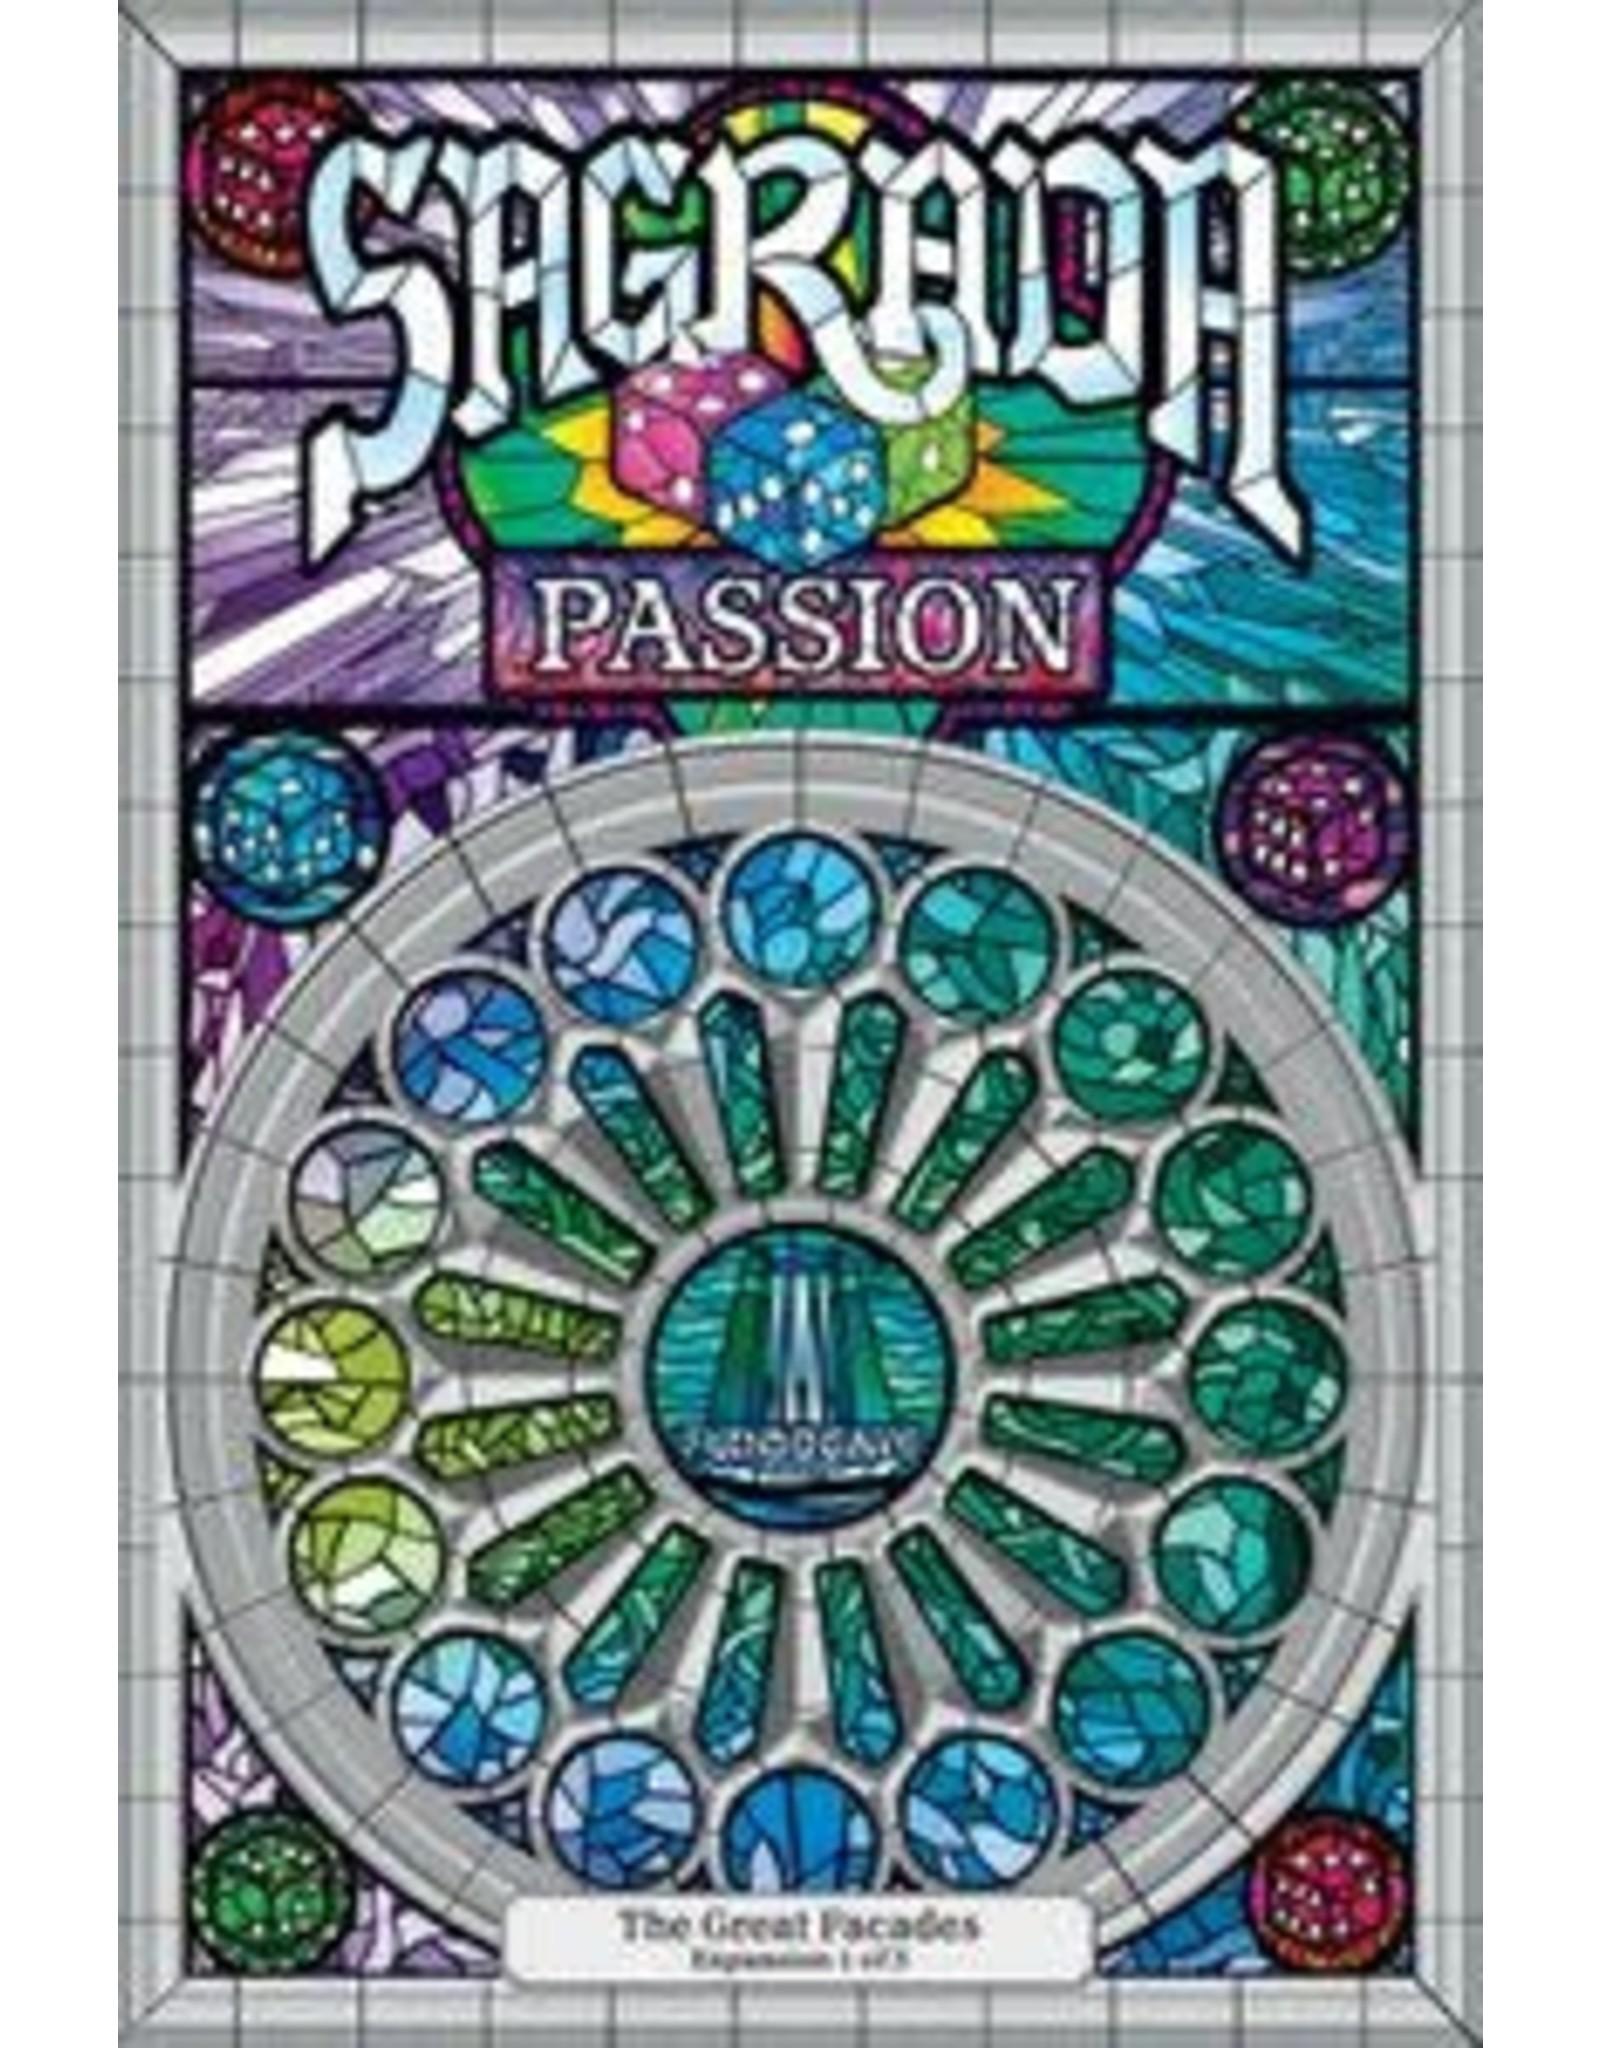 Sagrada: Passion Expansion